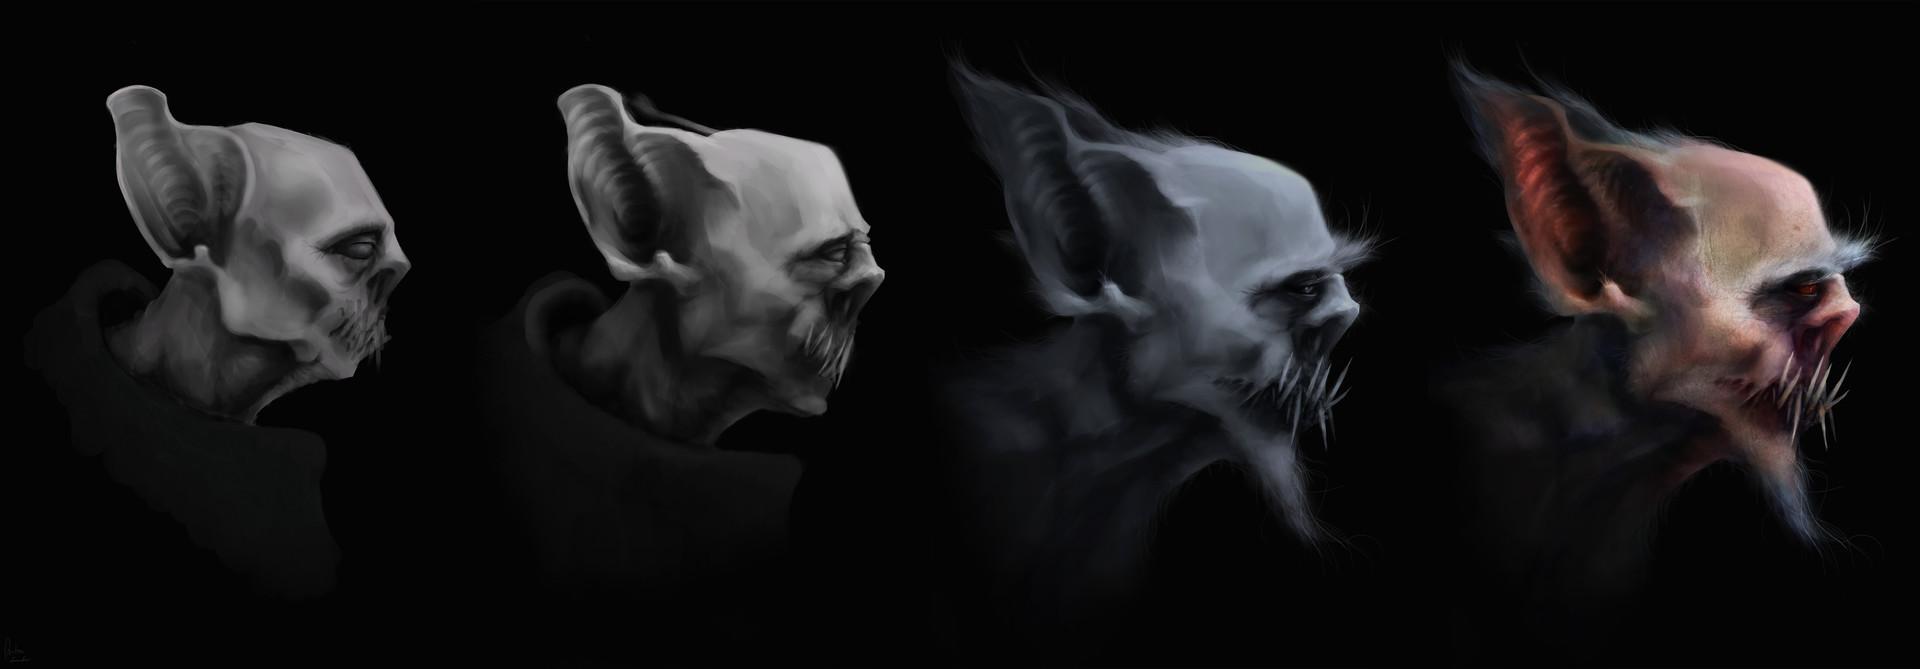 Anton sander vampiresteps